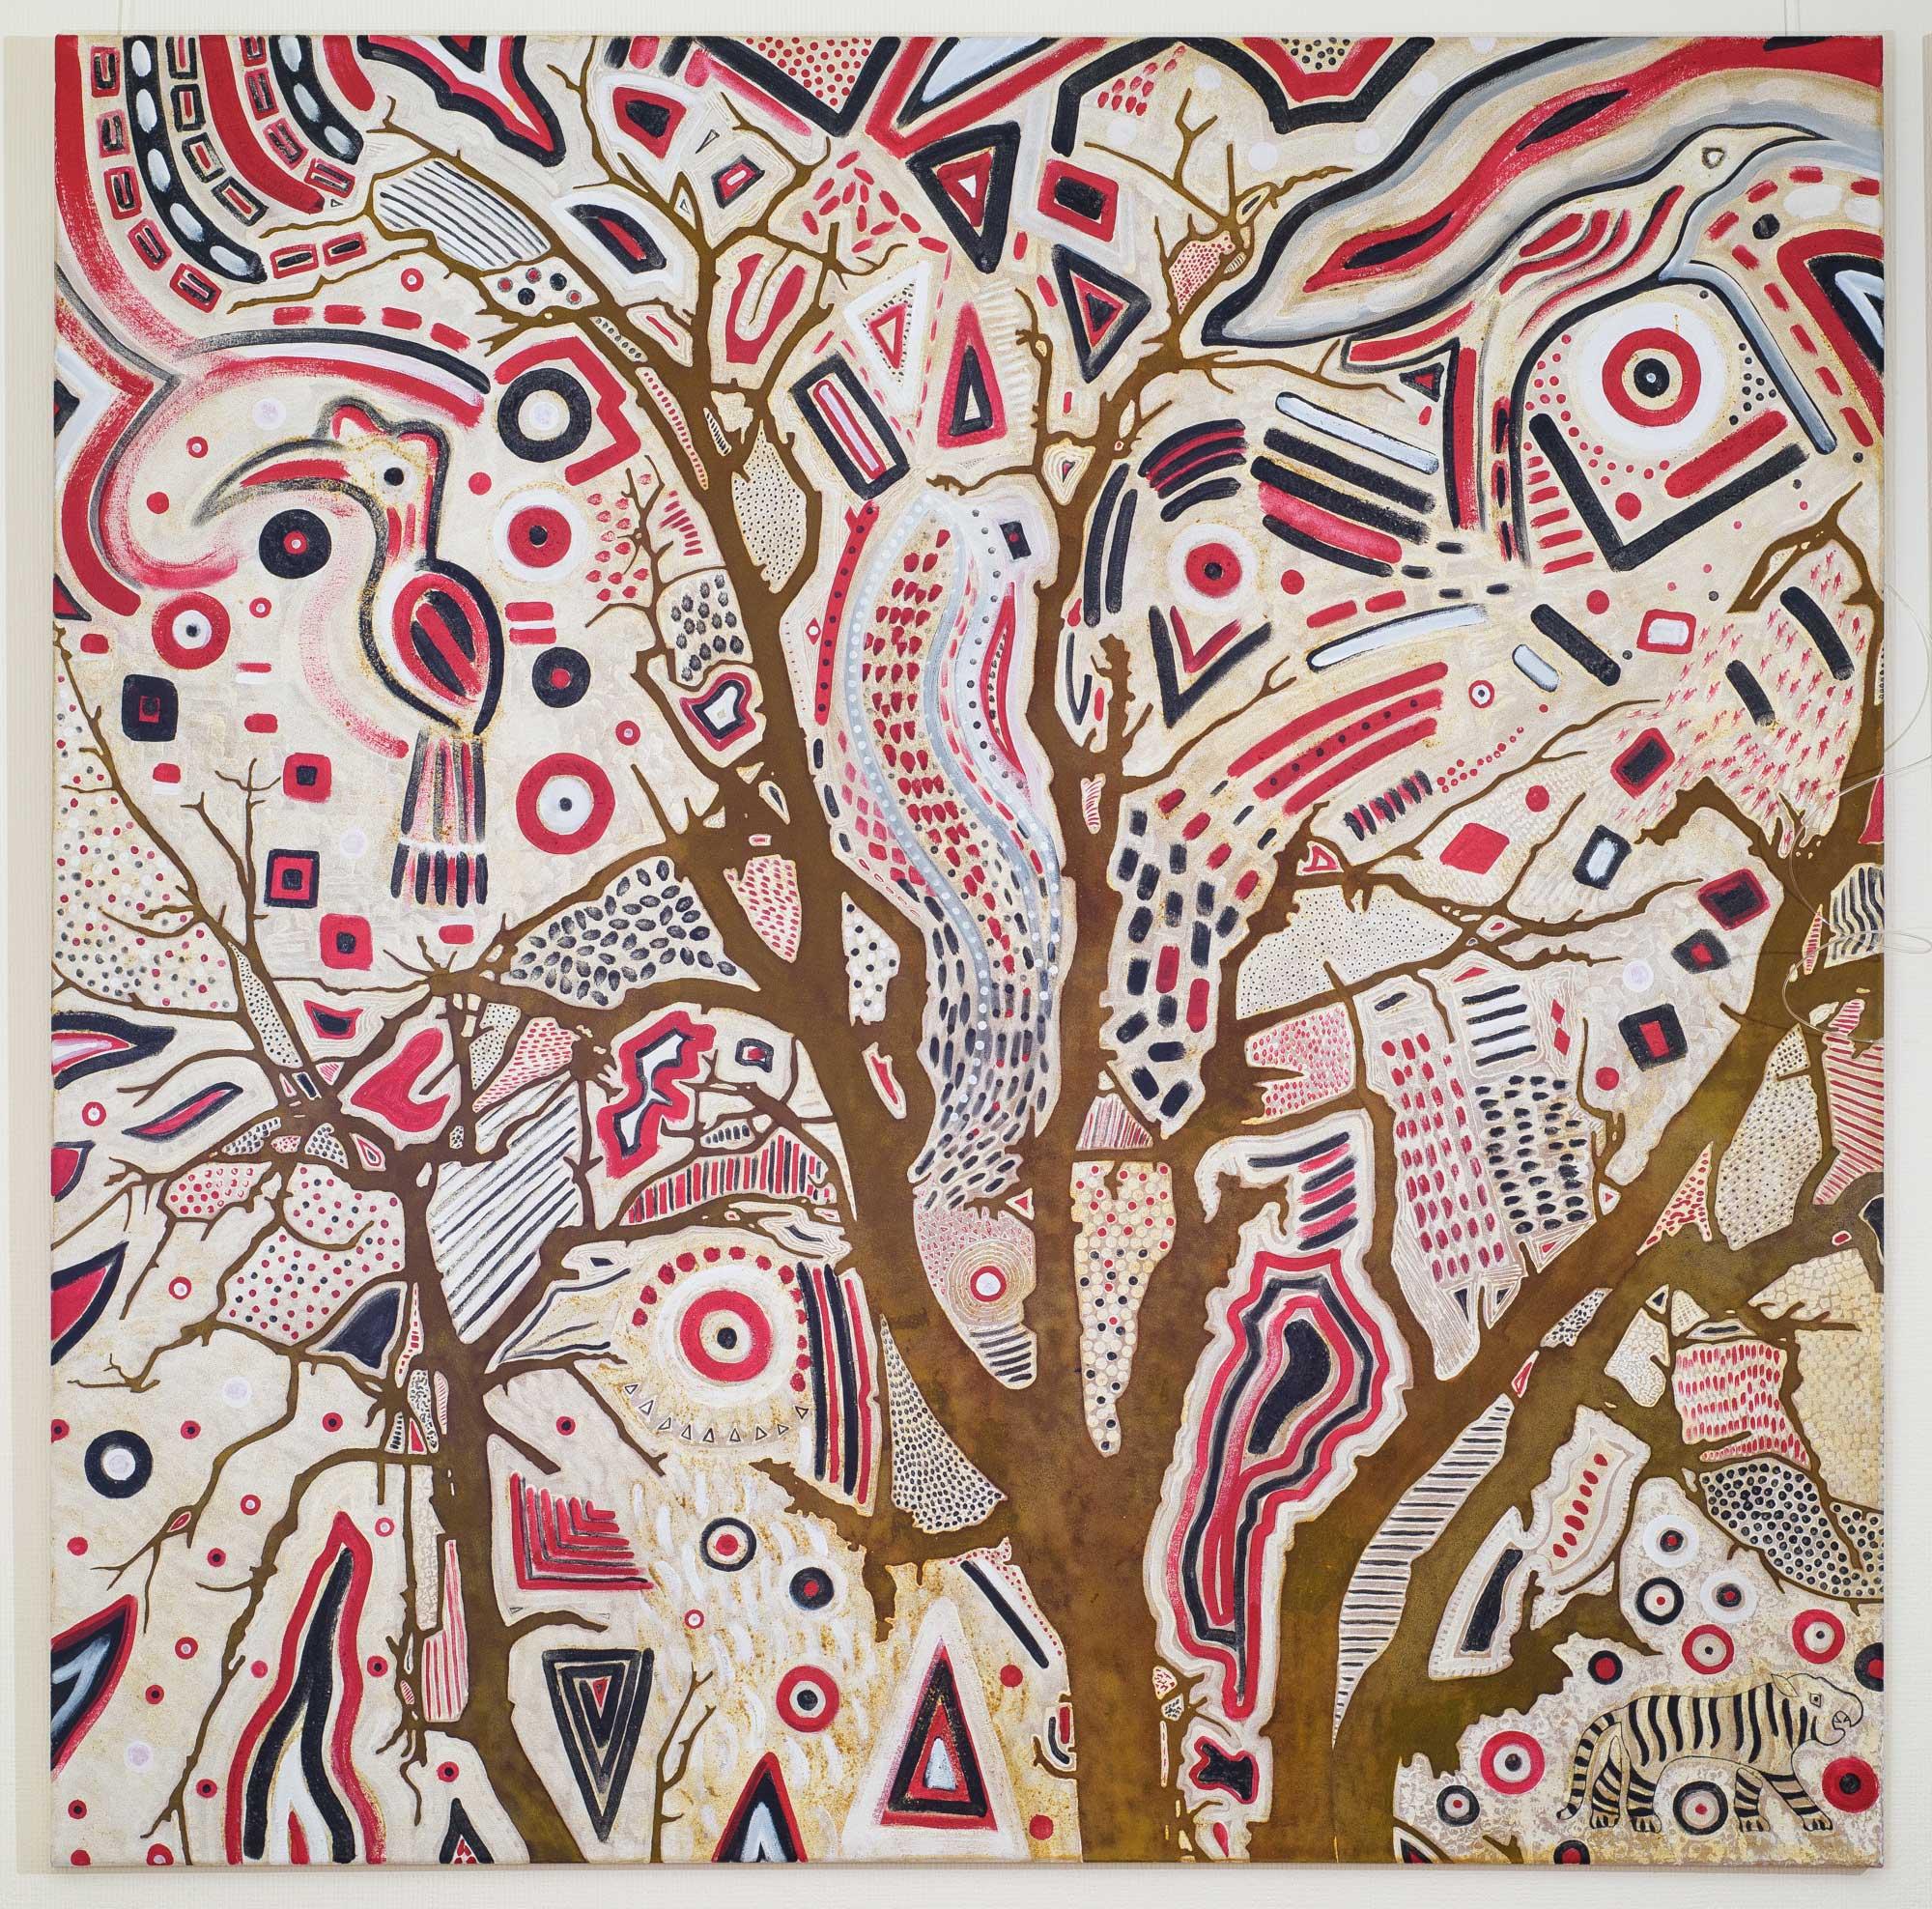 Alan Kilpatrick SSA The Sundarbans (Naga Tree)